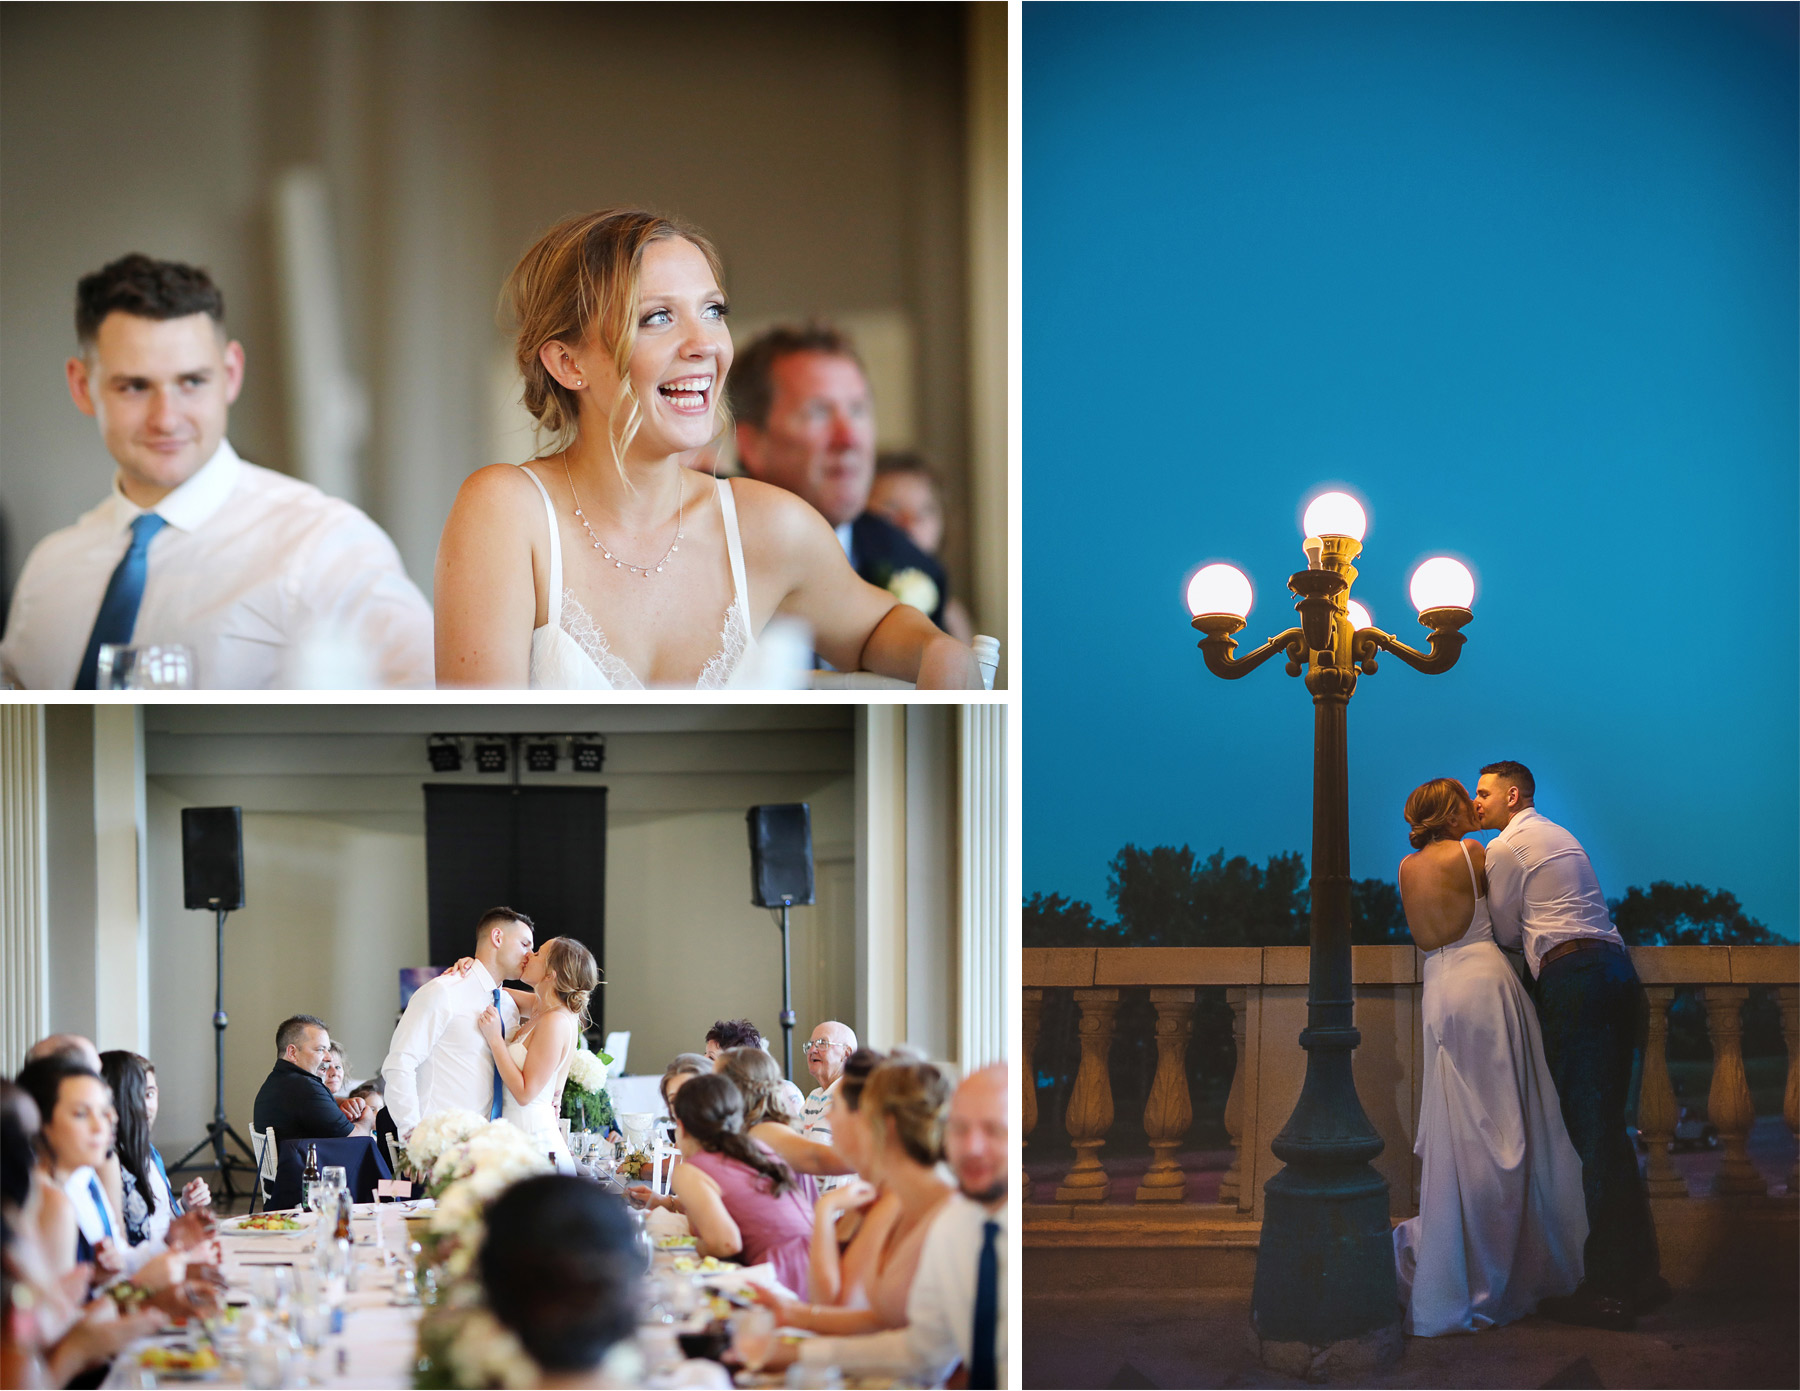 16-Minneapolis-Minnesota-Wedding-Andrew-Vick-Photography-Calhoun-Beach-Club-Reception-Toast-Night-Lanterns-Samantha-and-Ryan.jpg